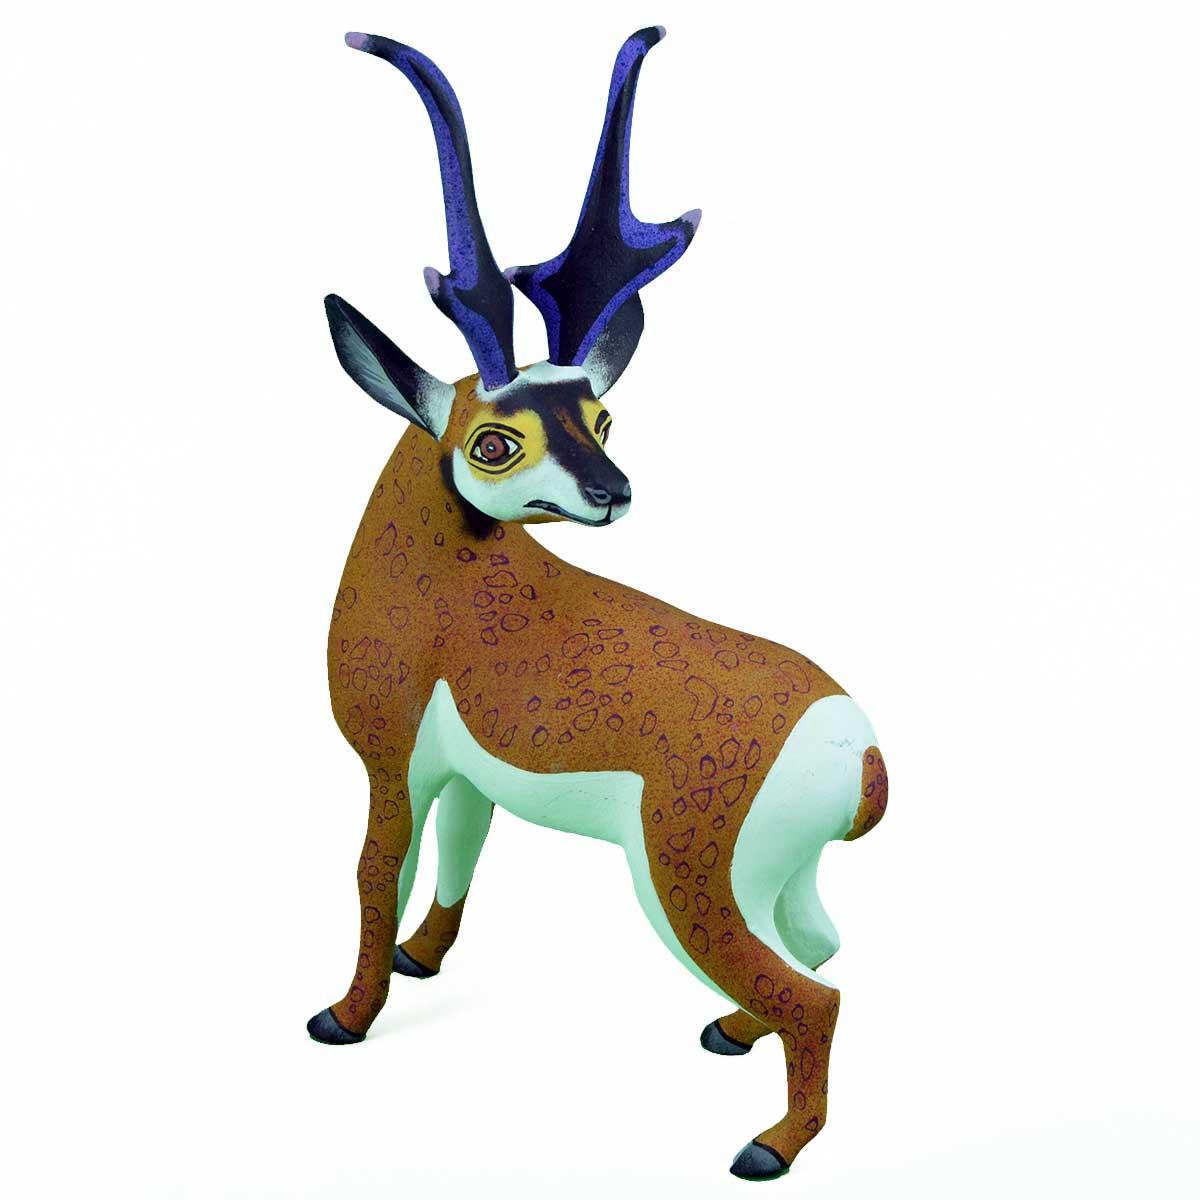 Eleazar Morales: Antelope